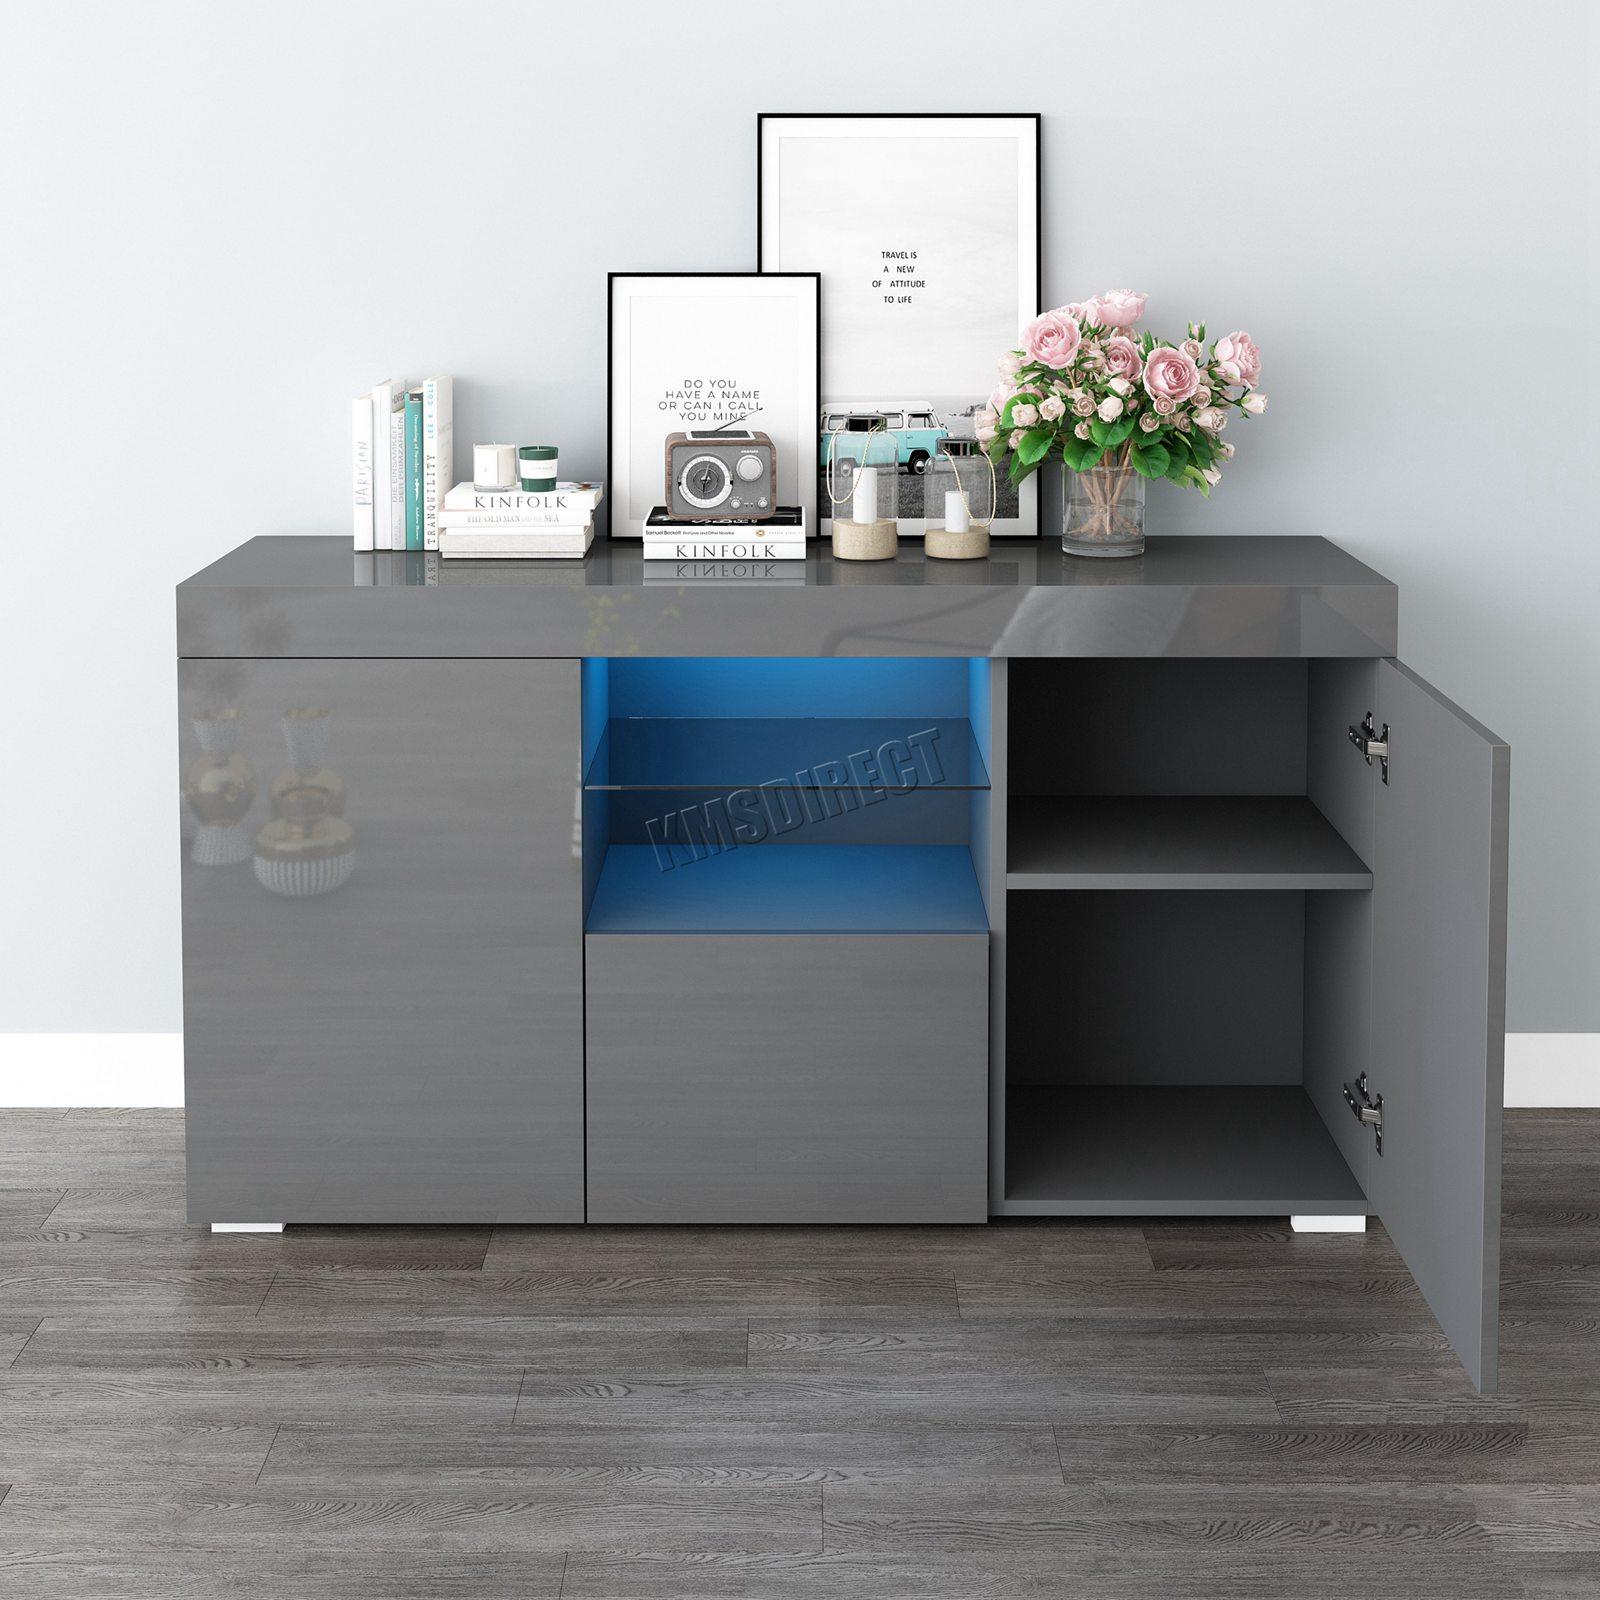 WestWood-PB-High-Gloss-Cabinet-LED-Bookshelf-Sideboard-Cupboard-Home-Unit-PHC03 thumbnail 23